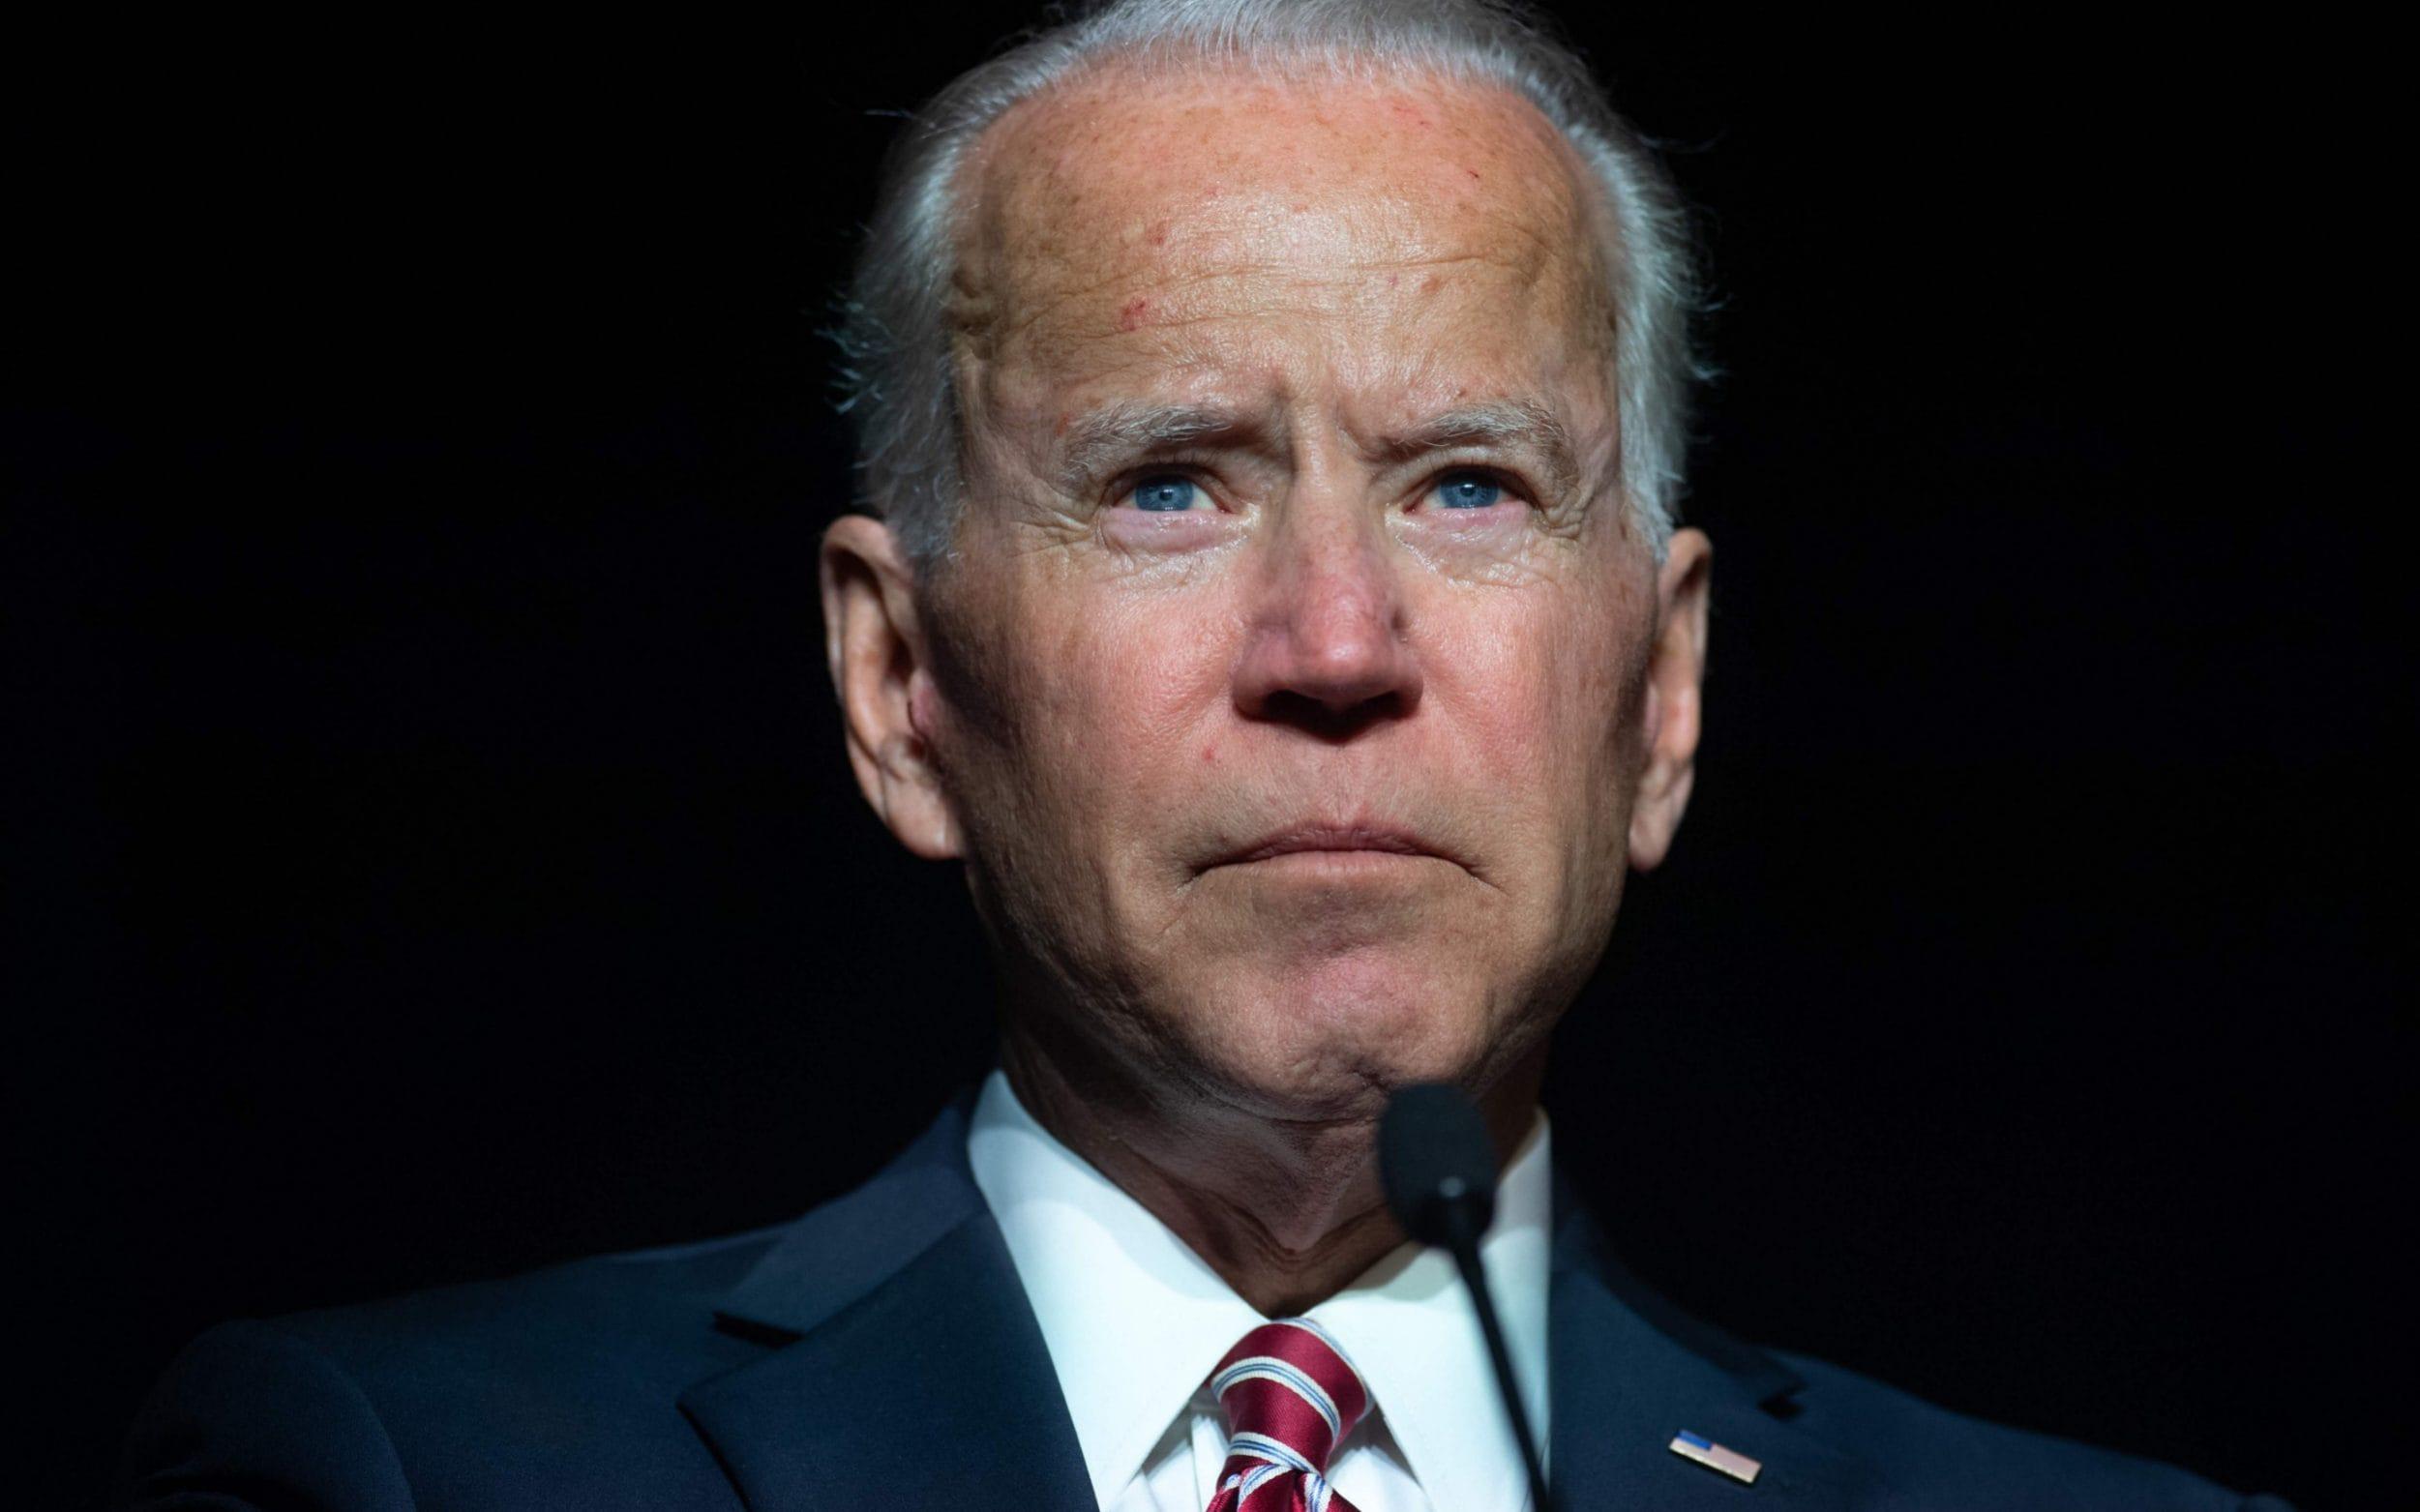 Joe Biden under fire for war hero story filled with inaccuracies